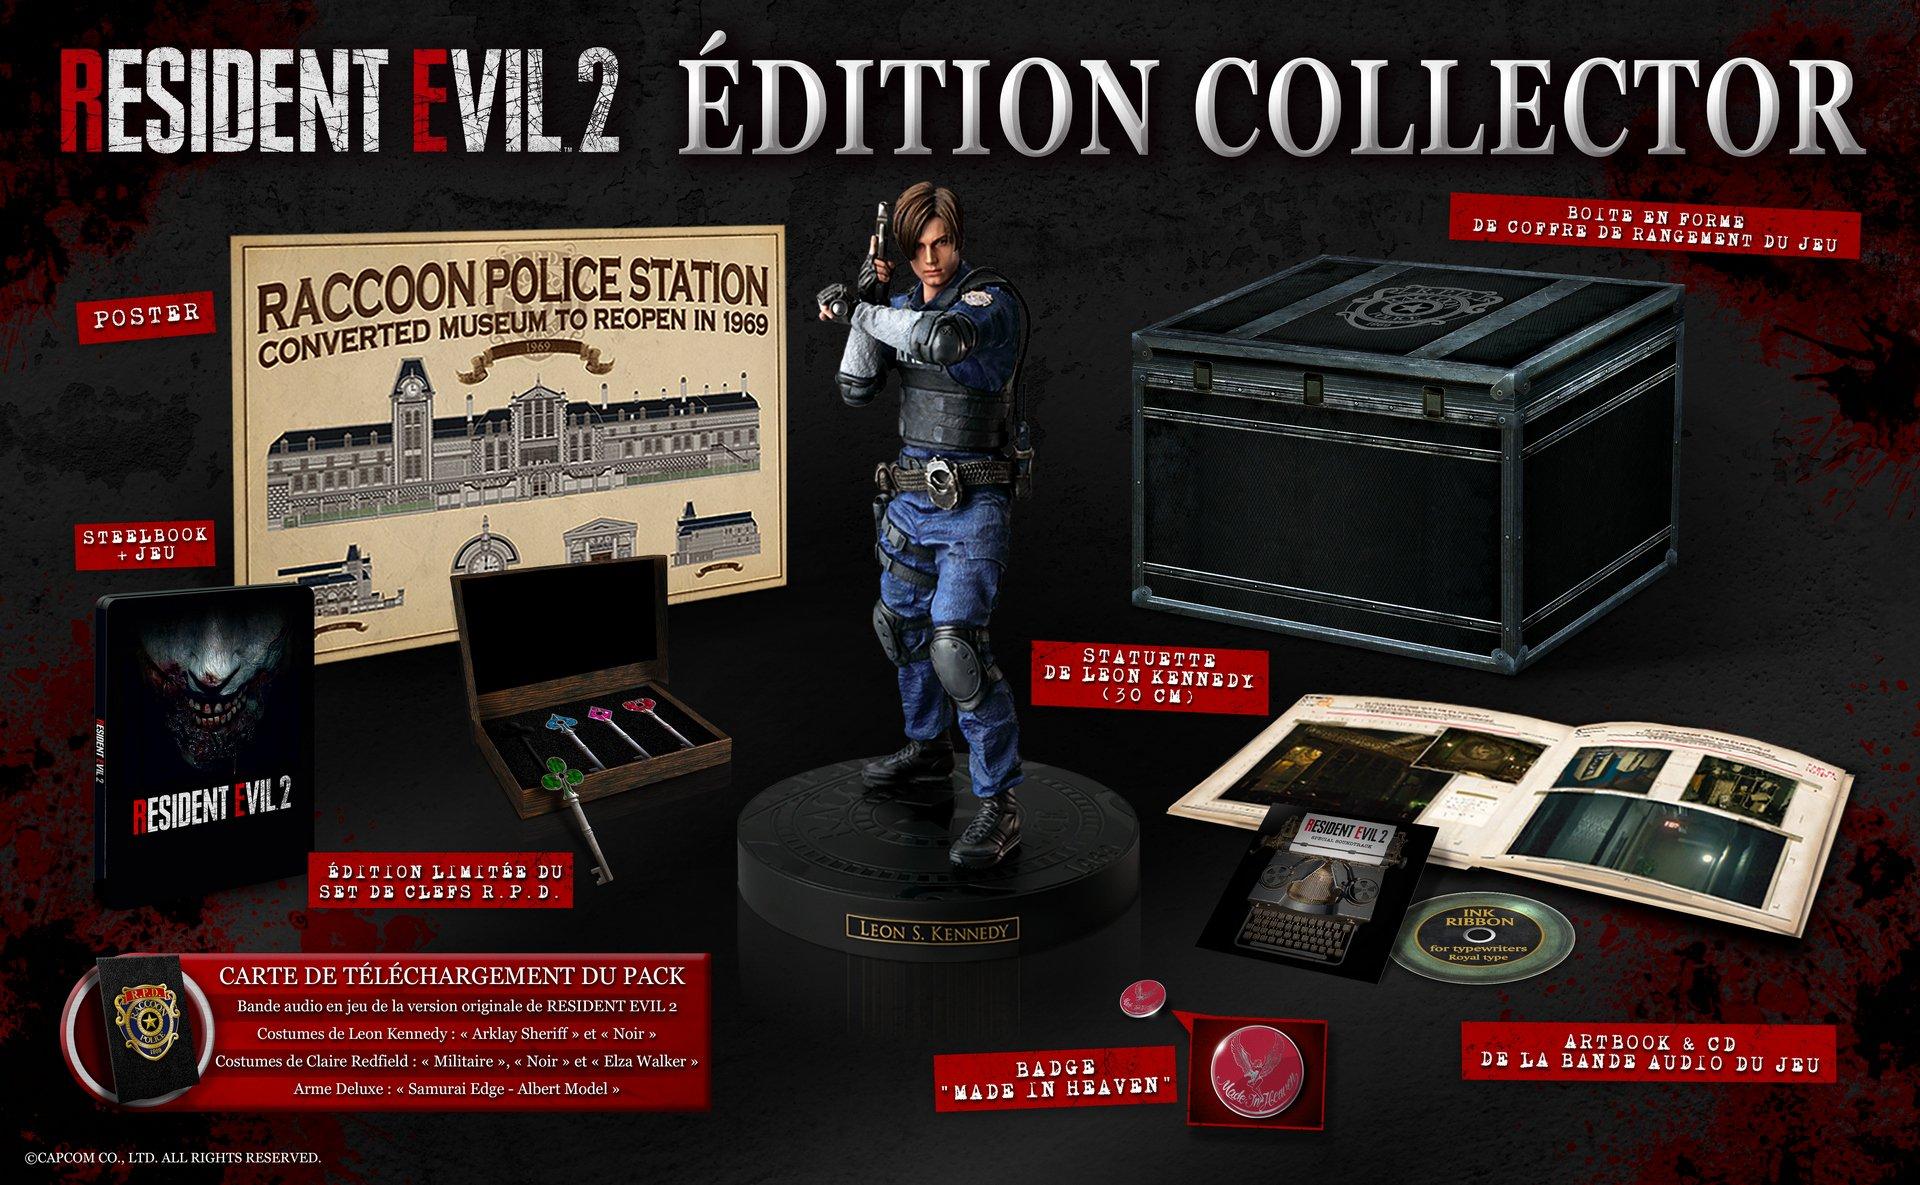 Contenu de l'Edition Collector Resident Evil 2